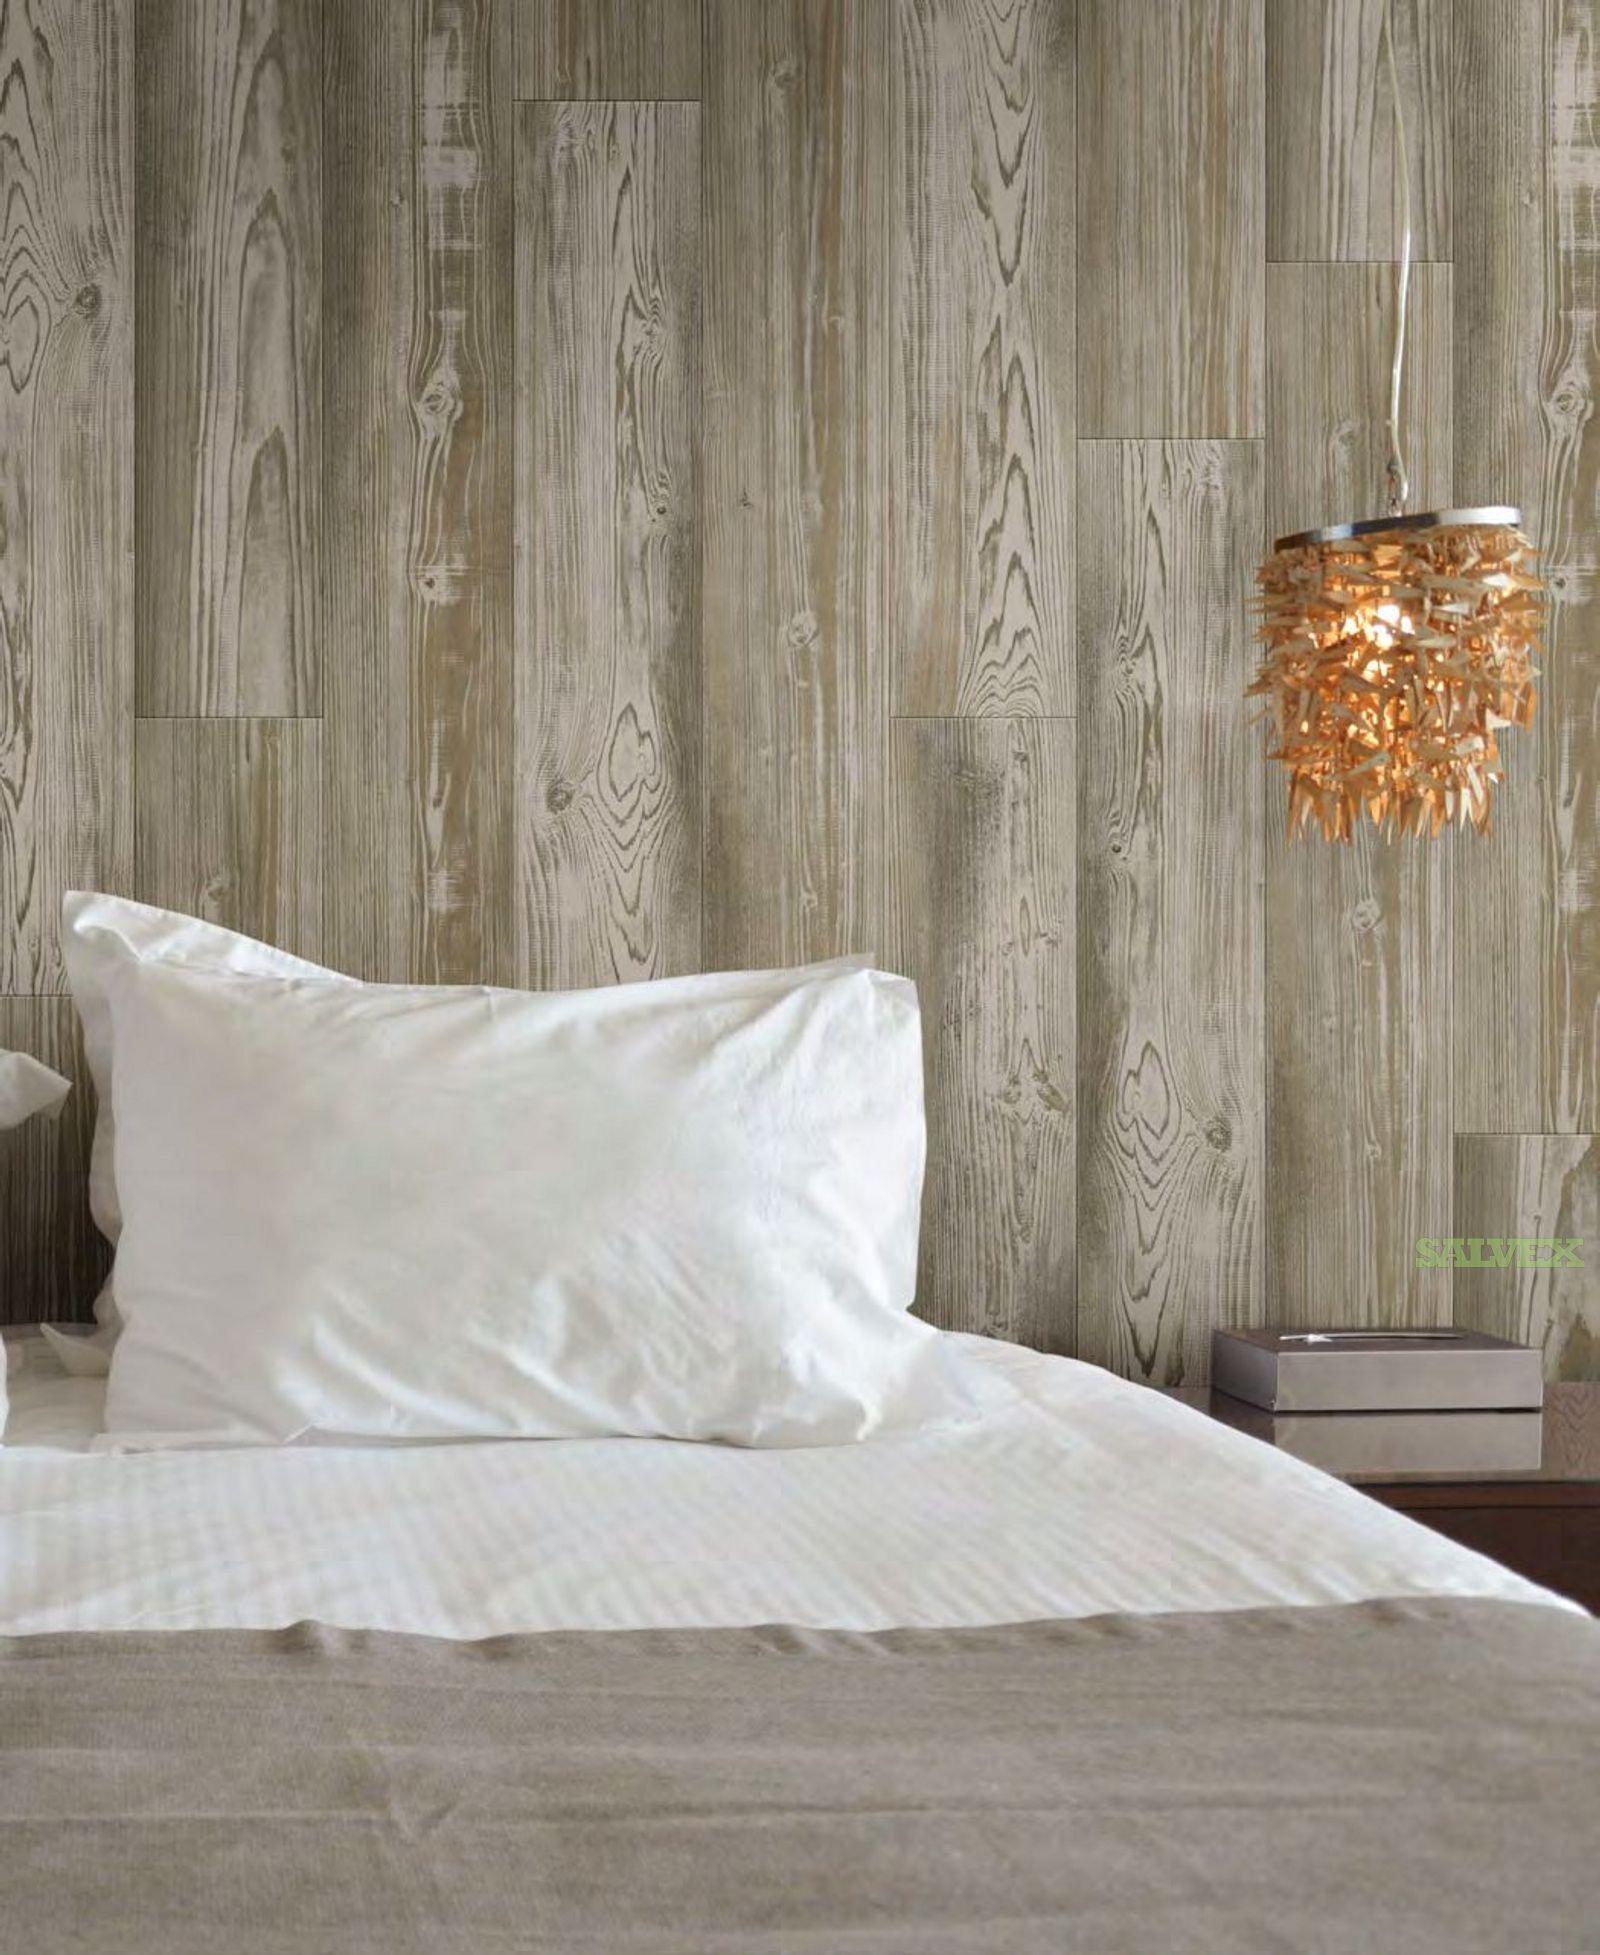 Vercade Wall Tiles (77,740 sq.ft.)